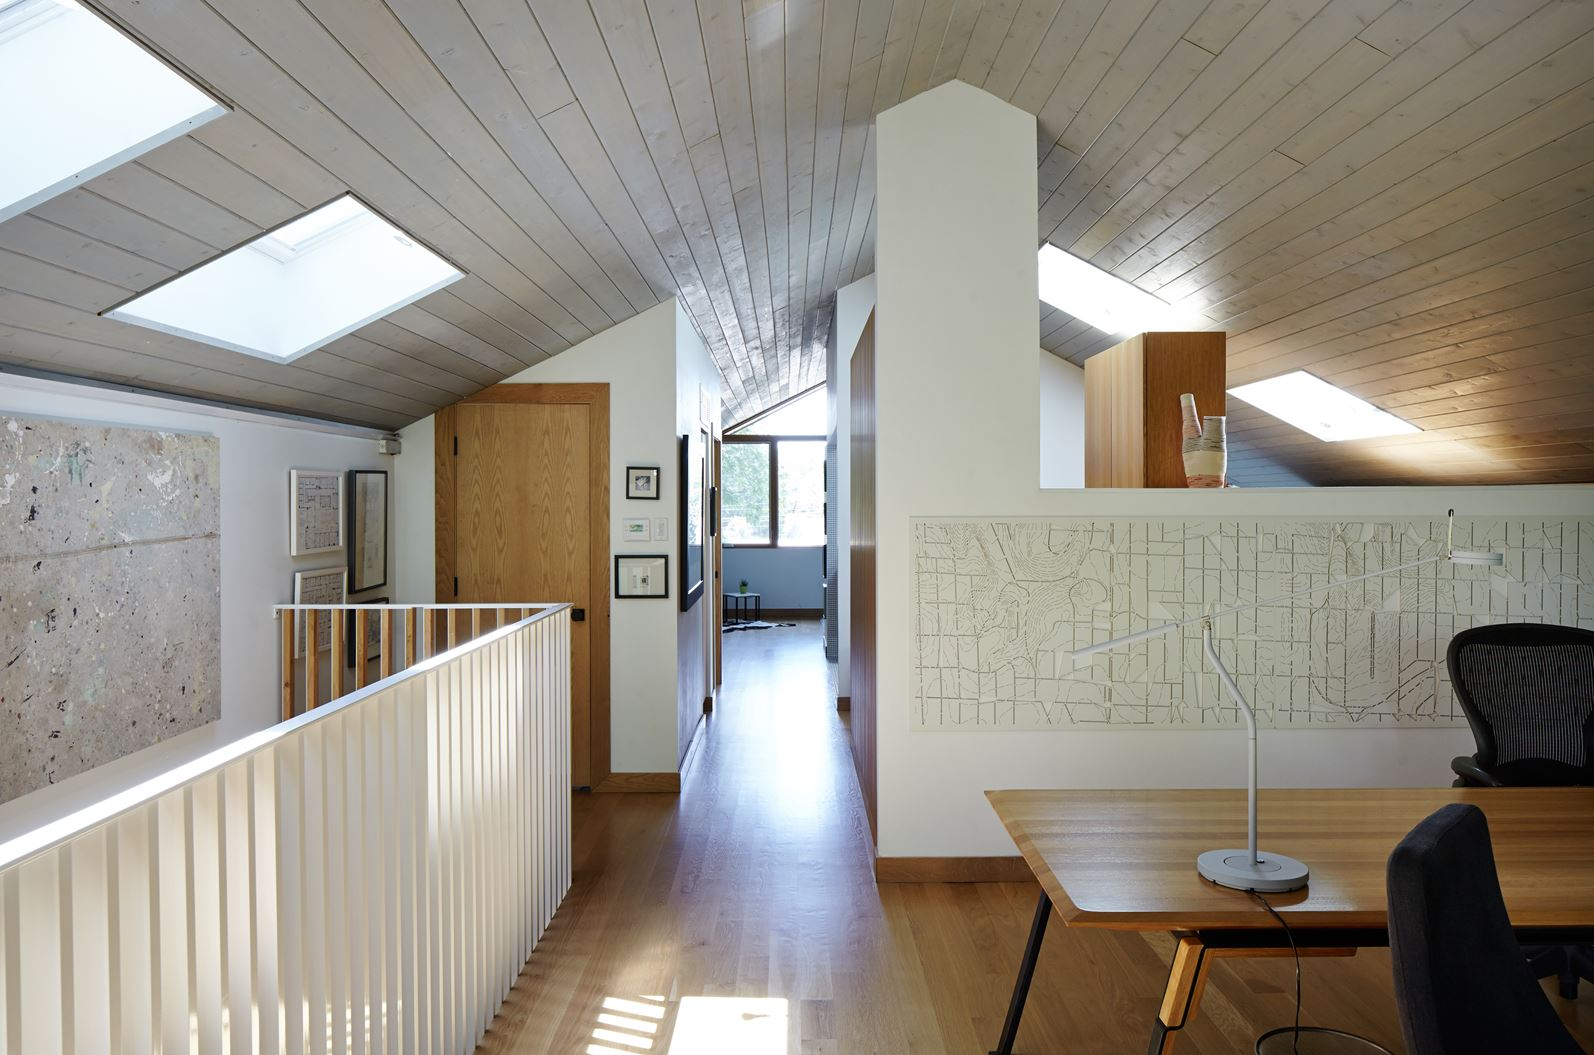 Una casa con mansarda costruita con materiali naturali - Mansarda.it